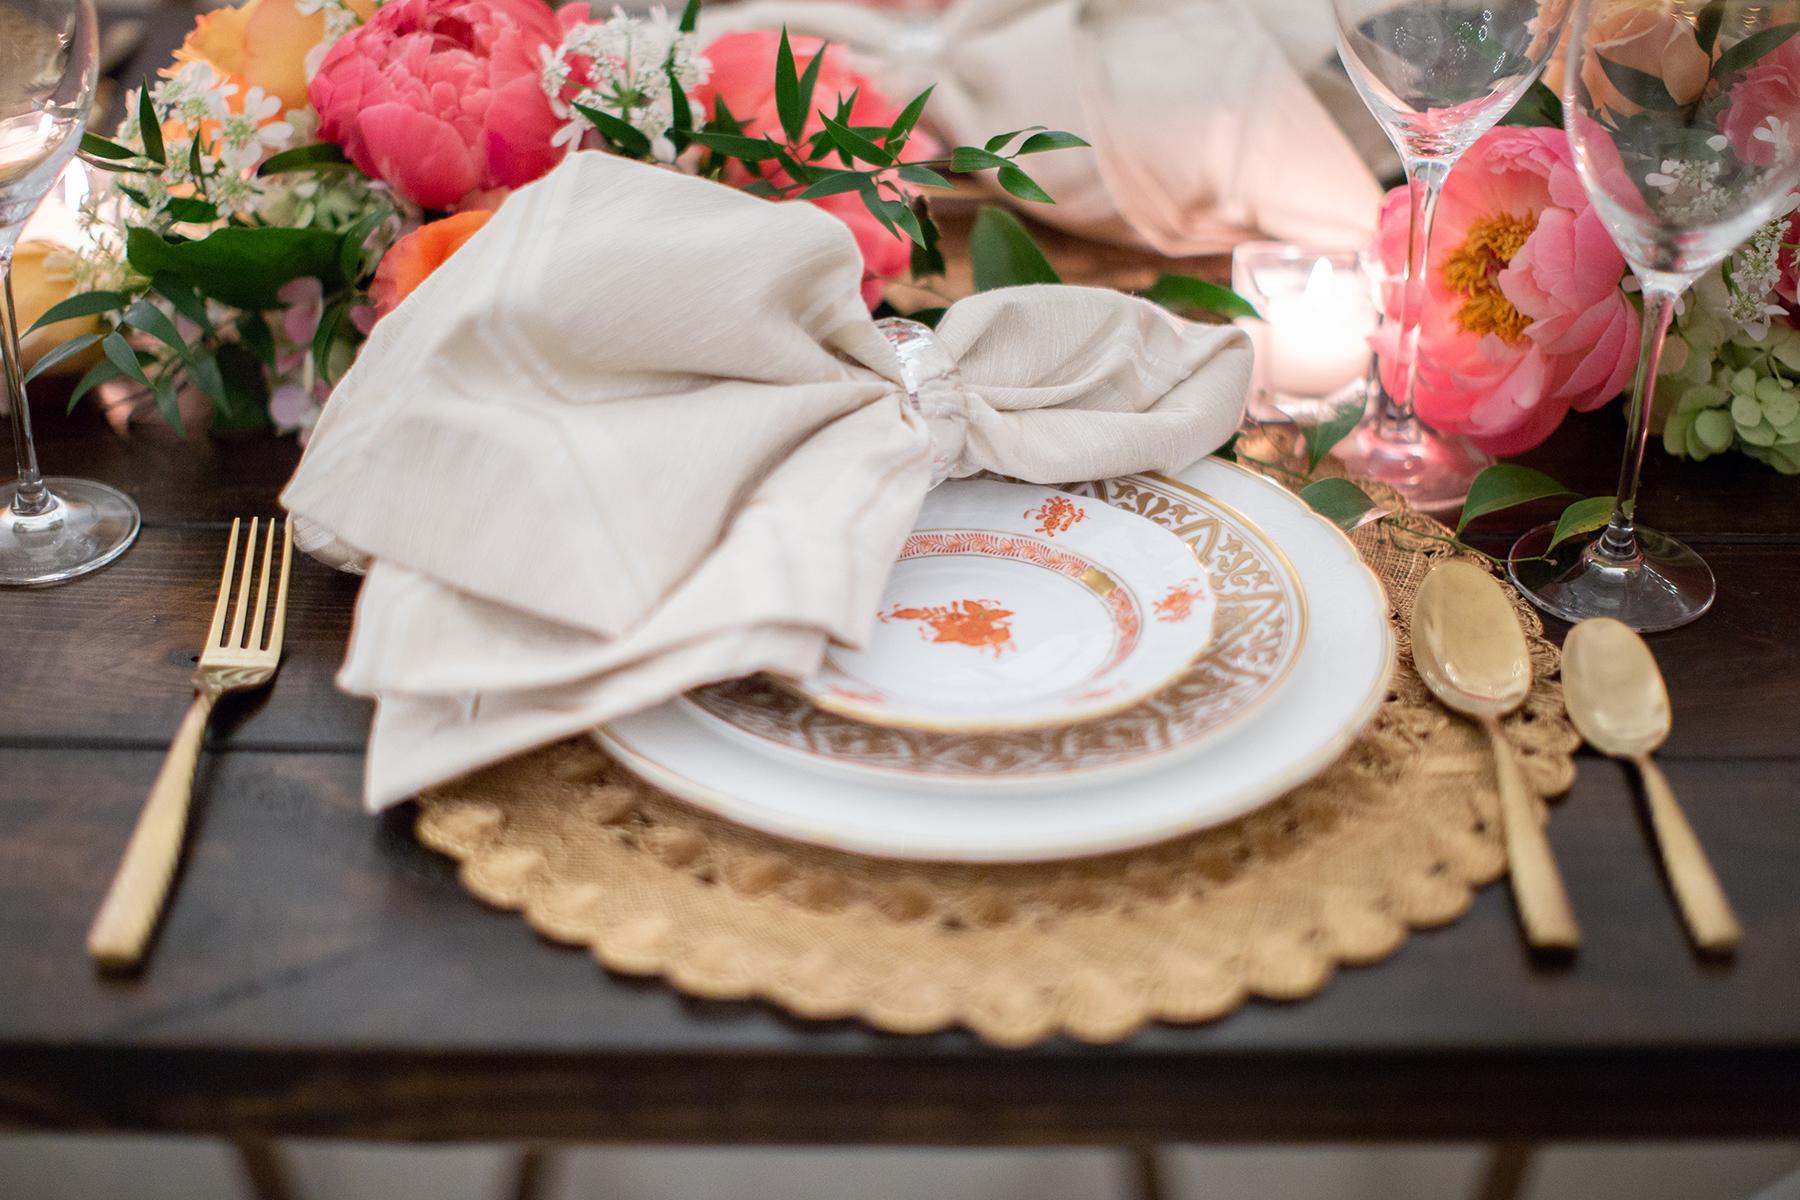 daytoremember.net | Eri Reyna Photography | Briscoe Manor | Richmond, Texas | A Day To Remember Houston Luxury Wedding Planning and Design